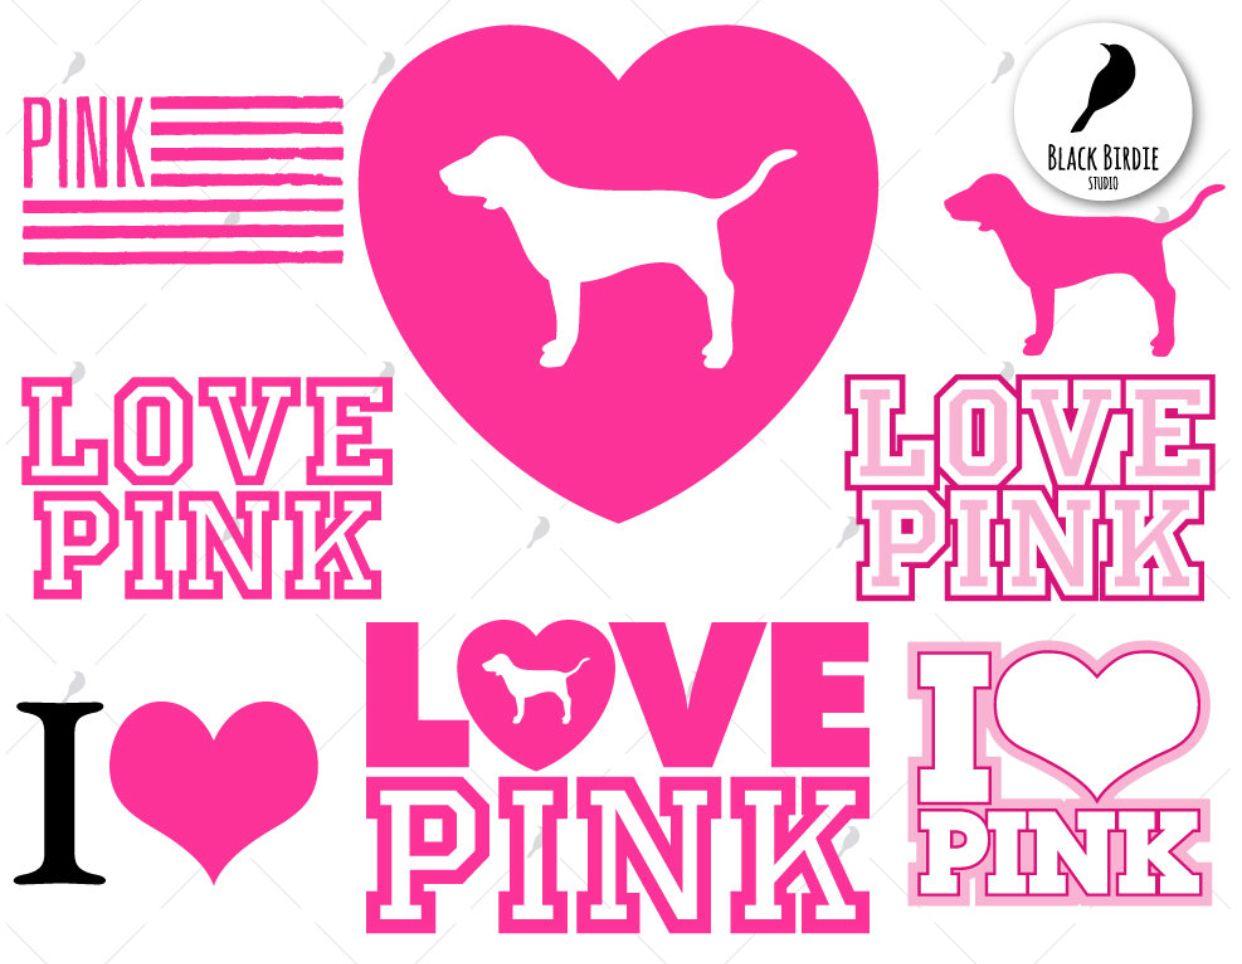 Idea by Debbie Prosser on Cricut Victoria secret pink